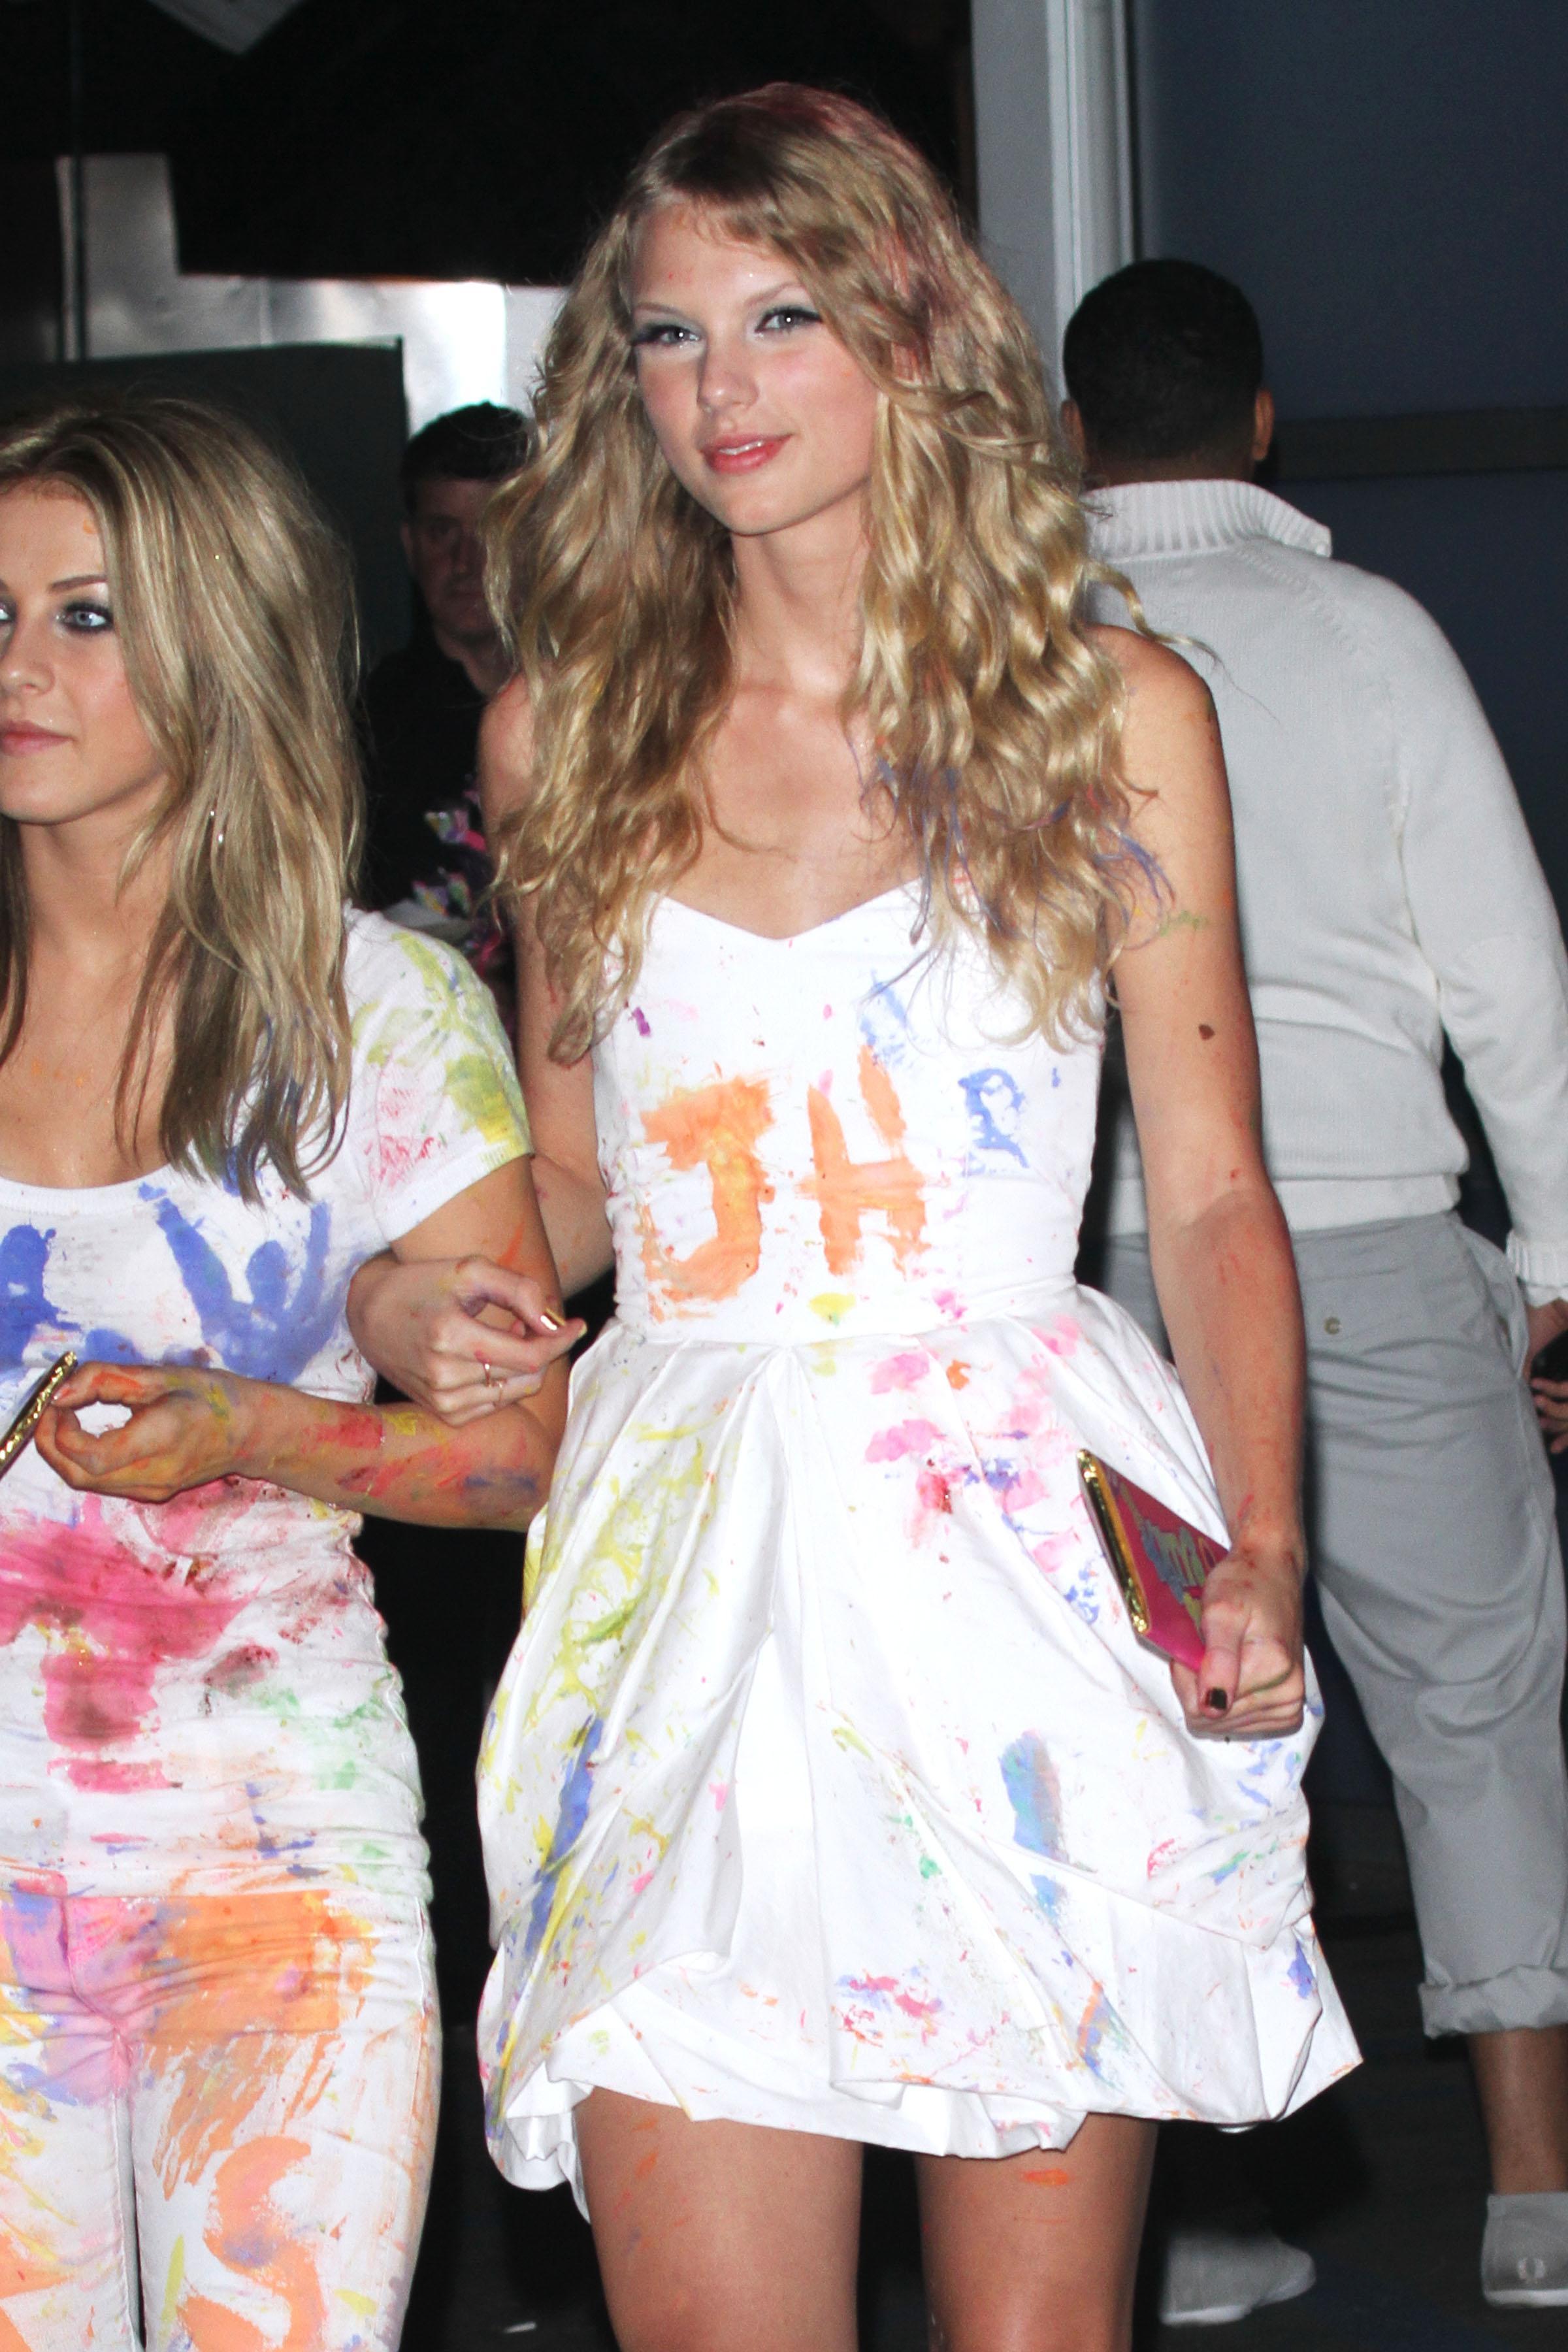 72235_Taylor_Swift_celebrates_Katy_Perrys_birthday_in_West_Hollywood-6_122_225lo.jpg